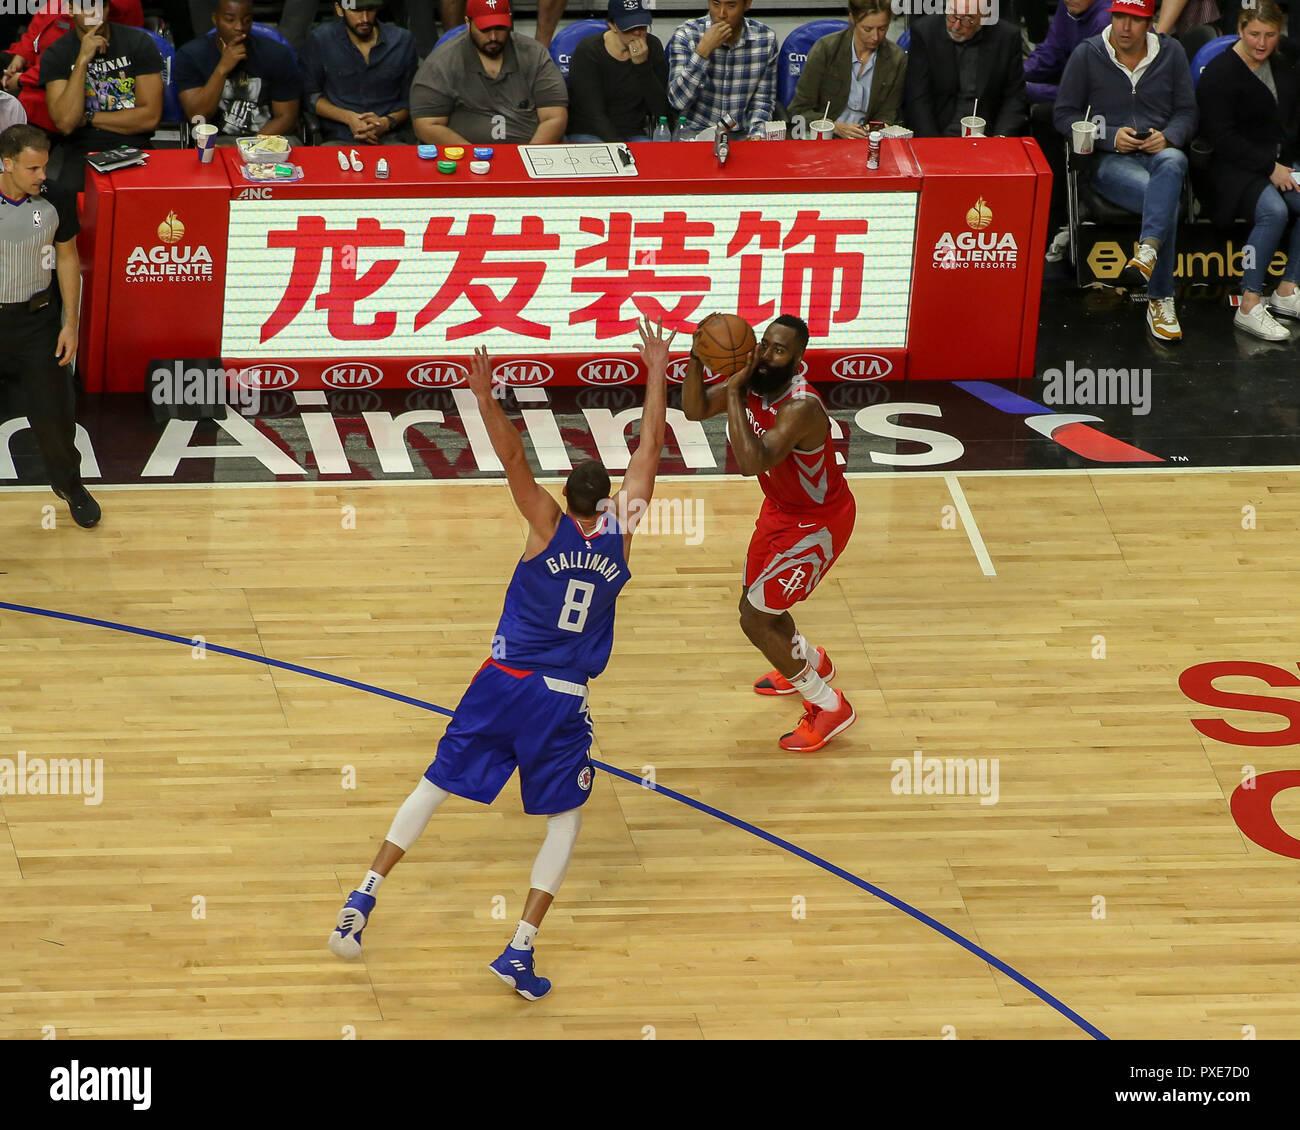 Houston Rockets News Today: James Harden Usa Basketball Stock Photos & James Harden